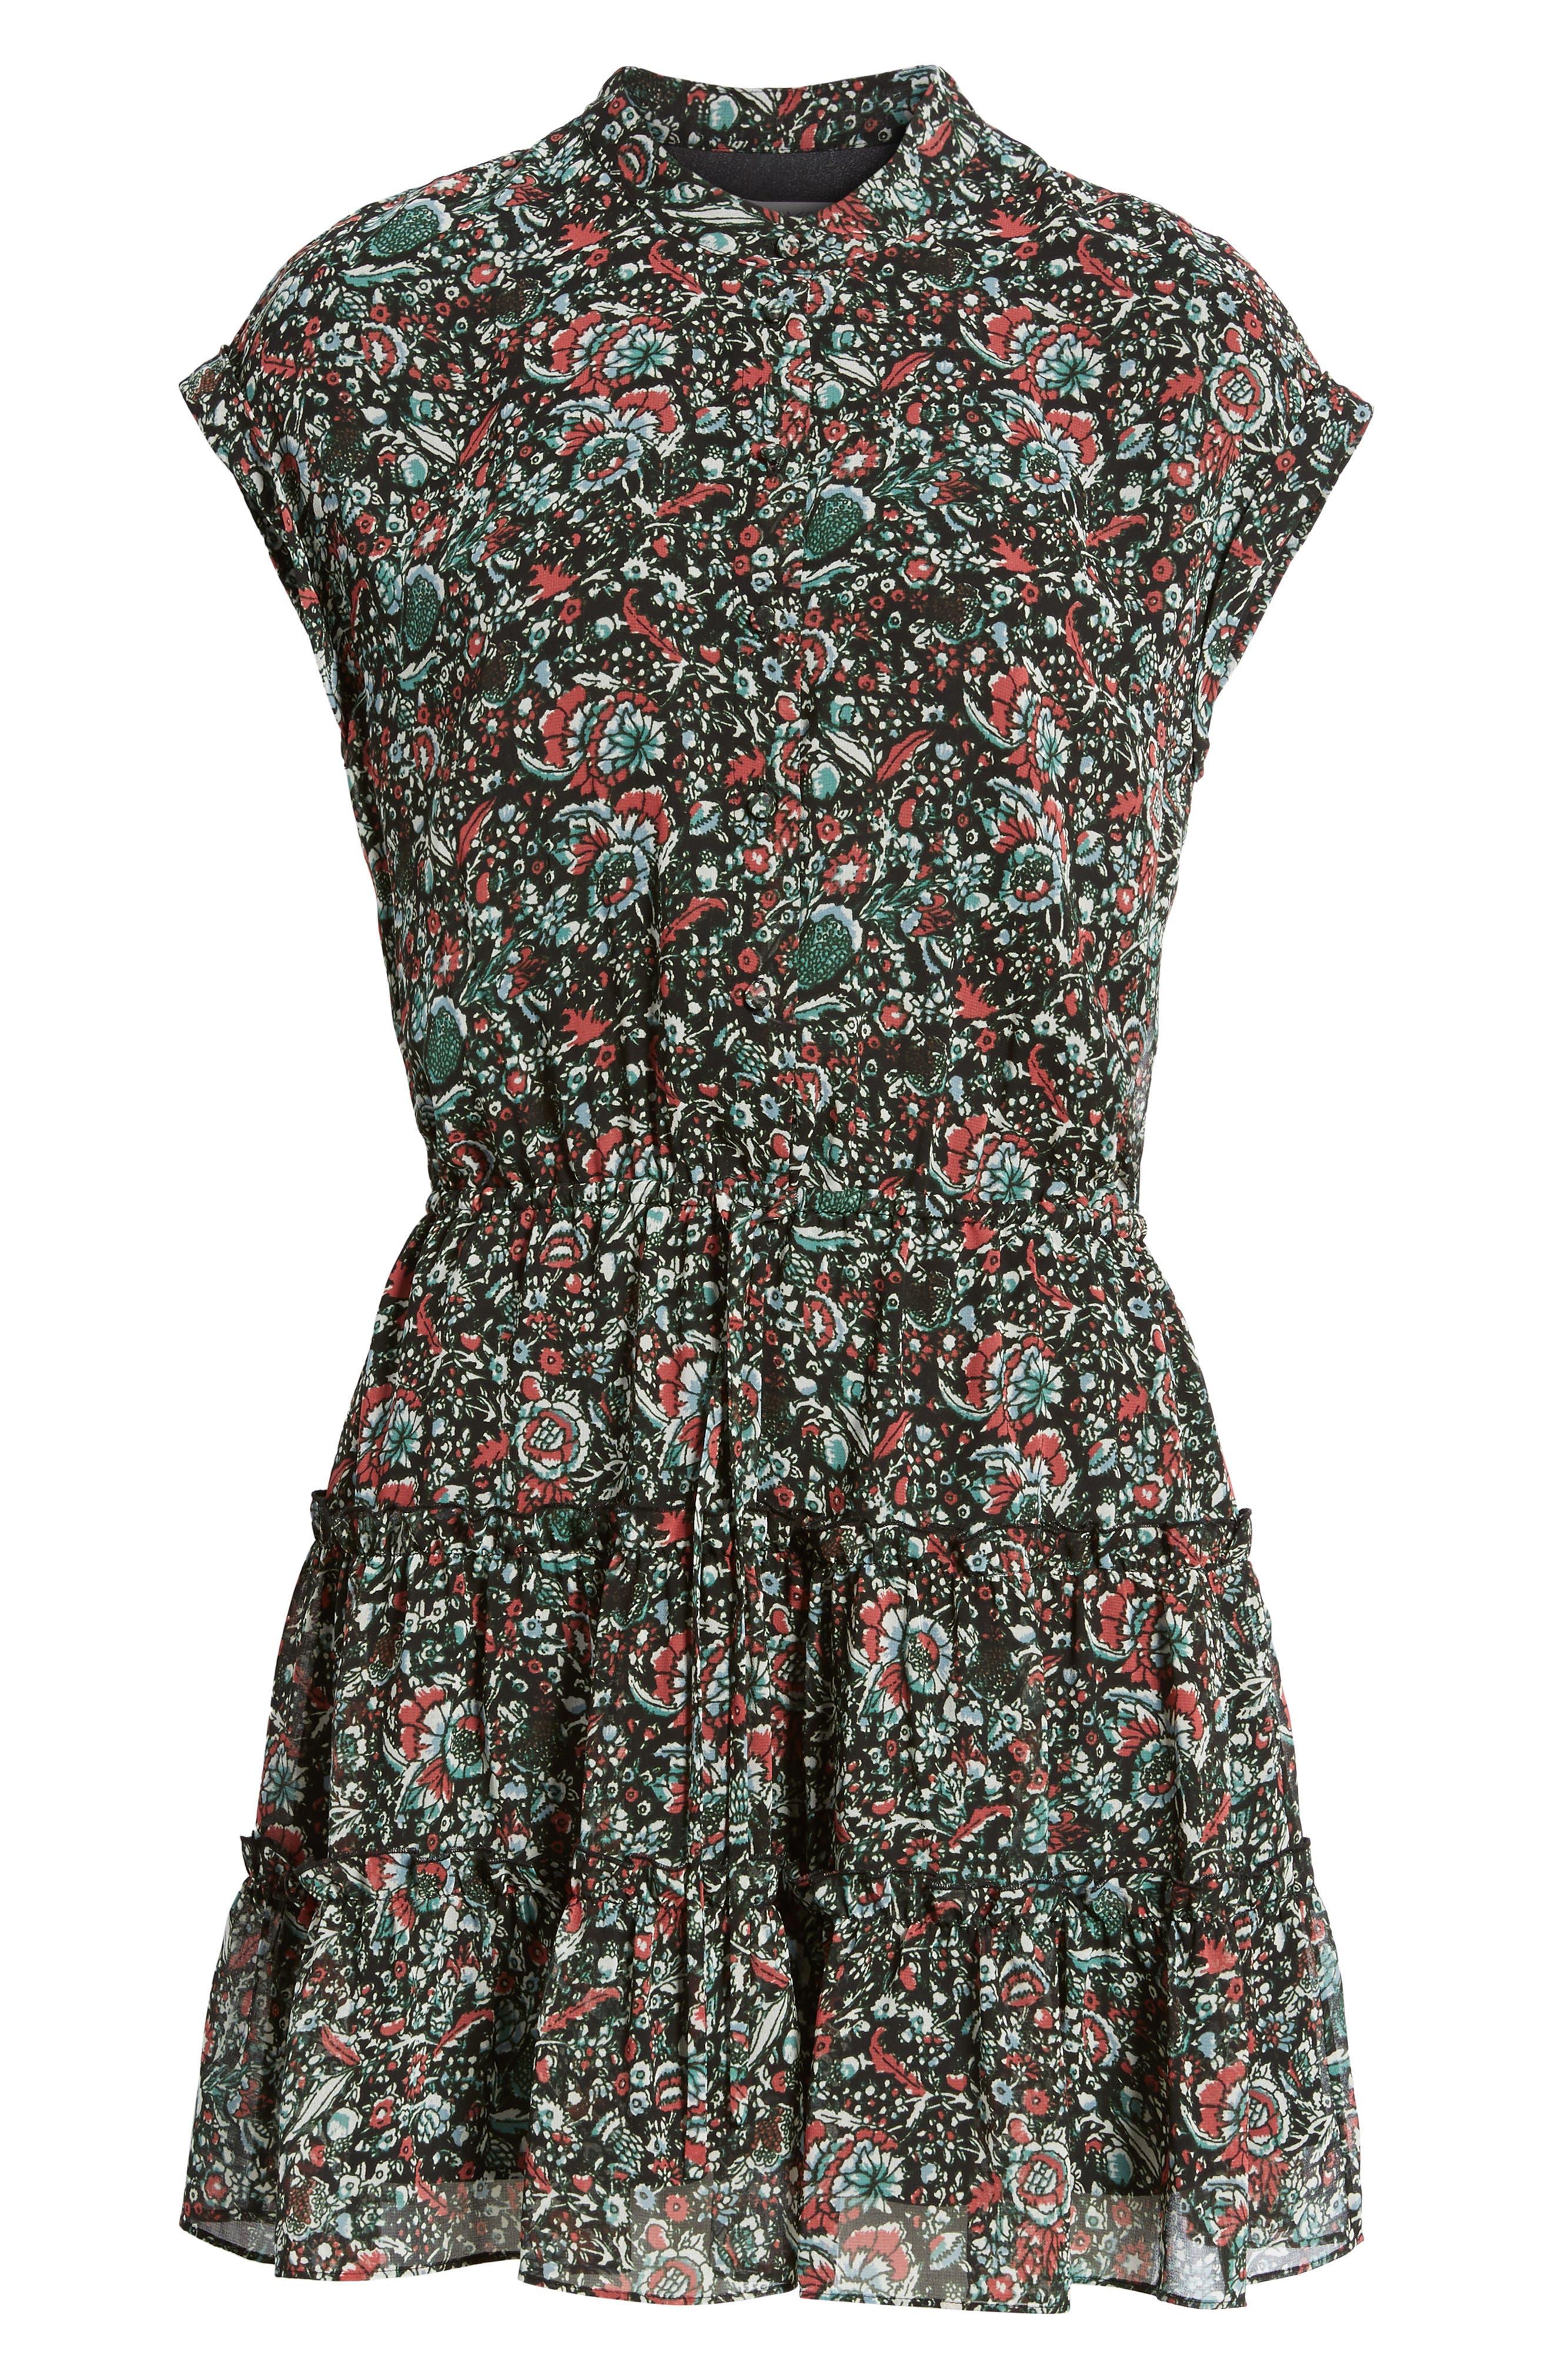 Ollie Dress,                             Alternate thumbnail 6, color,                             002